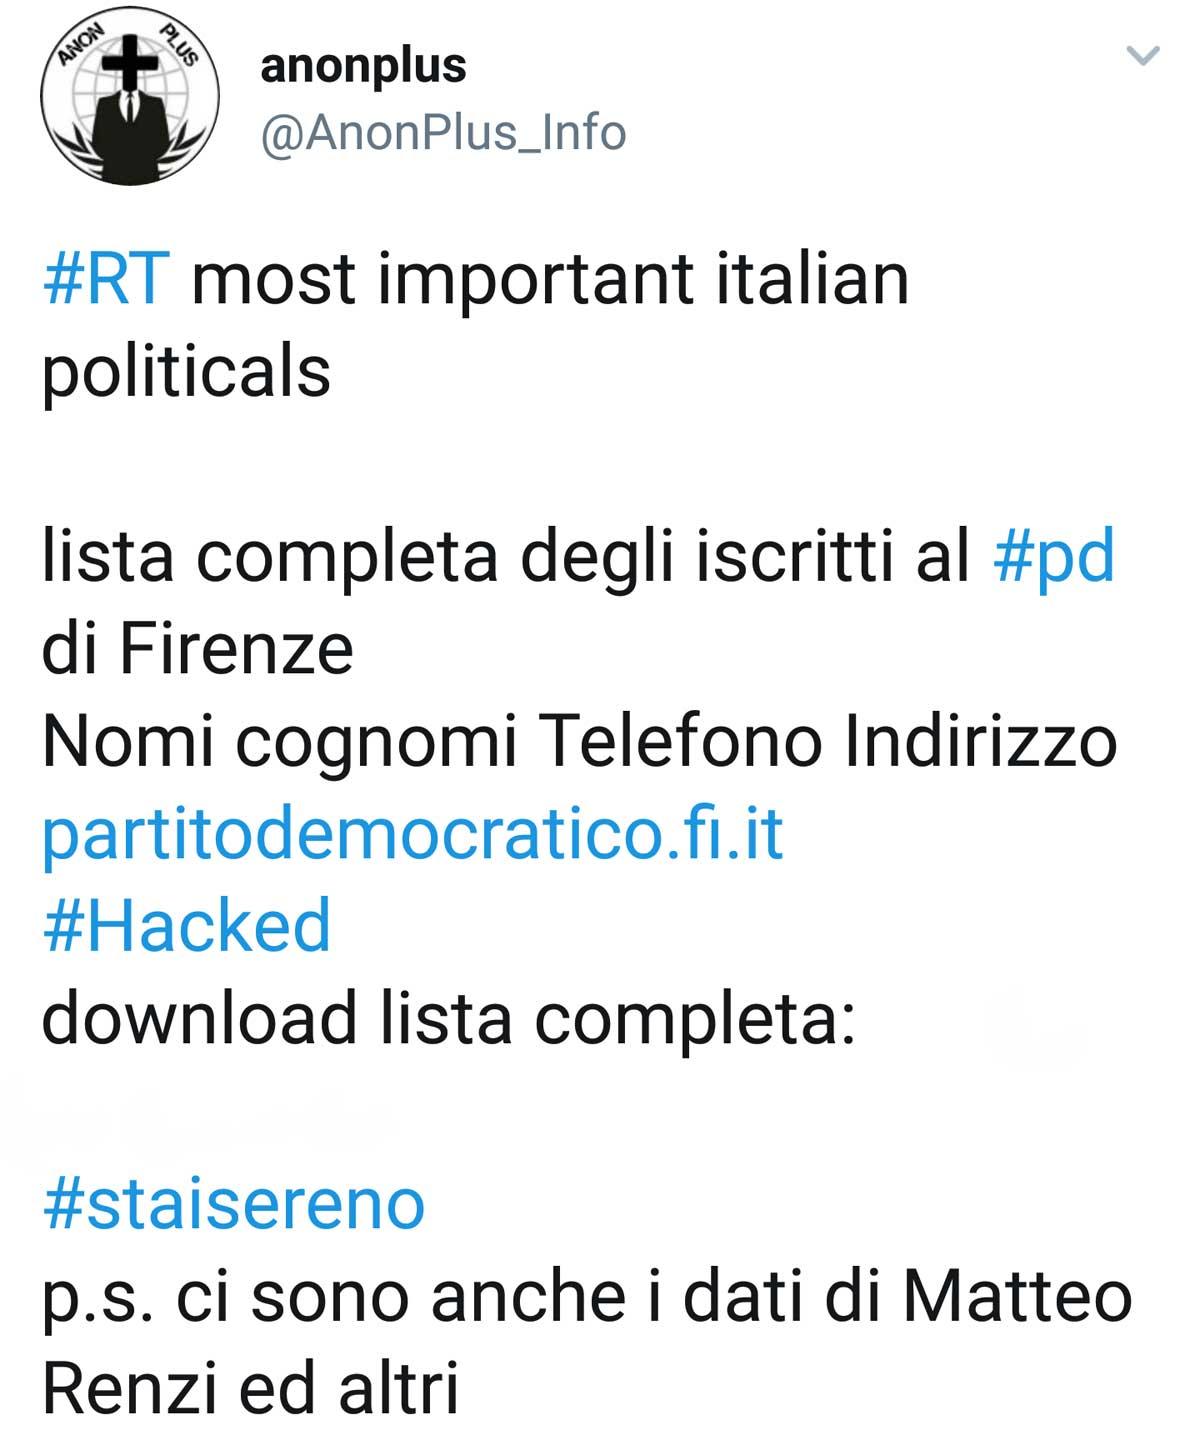 Attacco hacker al Pd, online i dati di Renzi